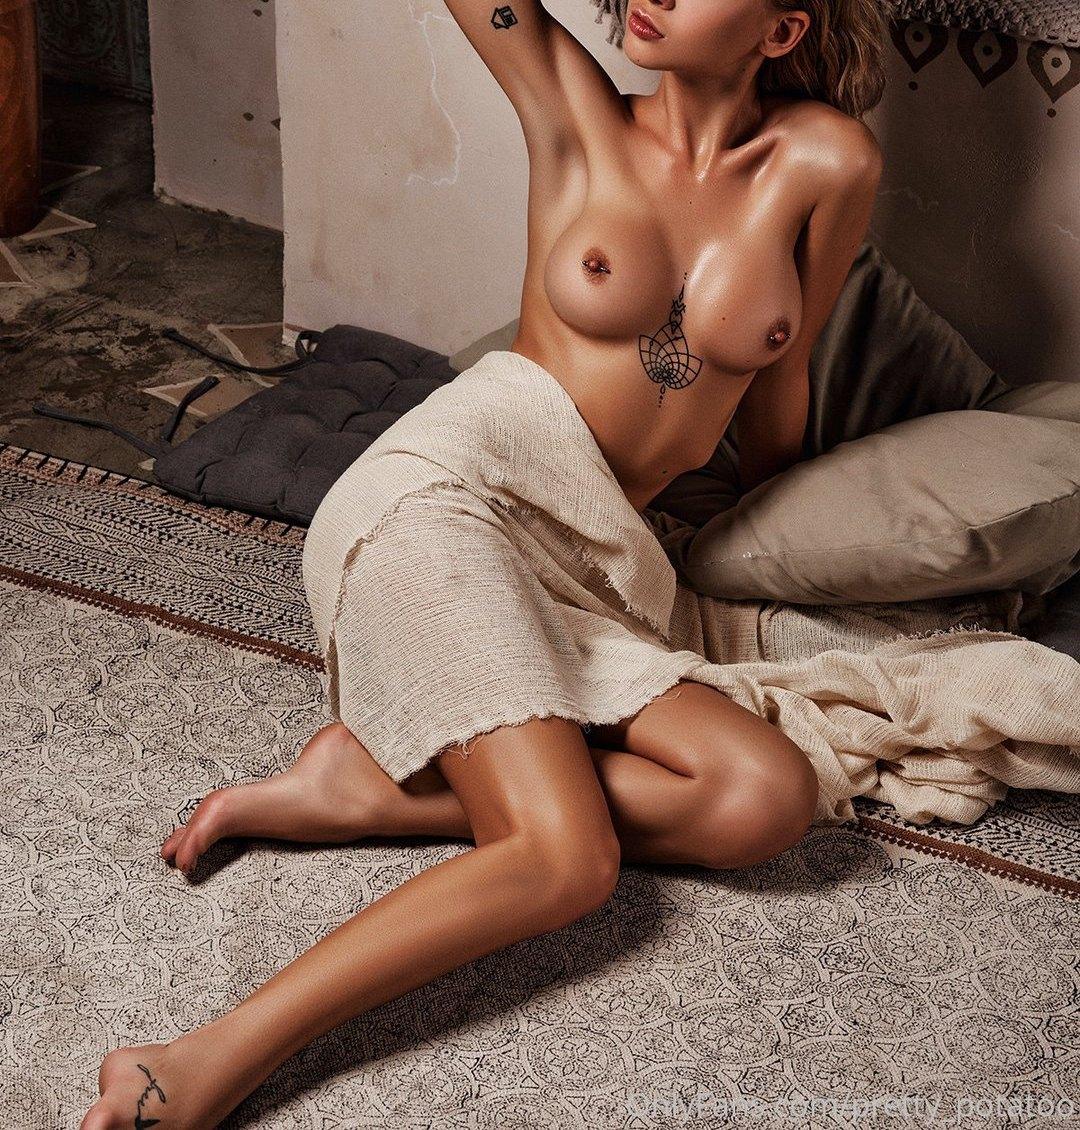 Janna Pavlova Pretty Potatoo Onlyfans Nudes Leaks 0028